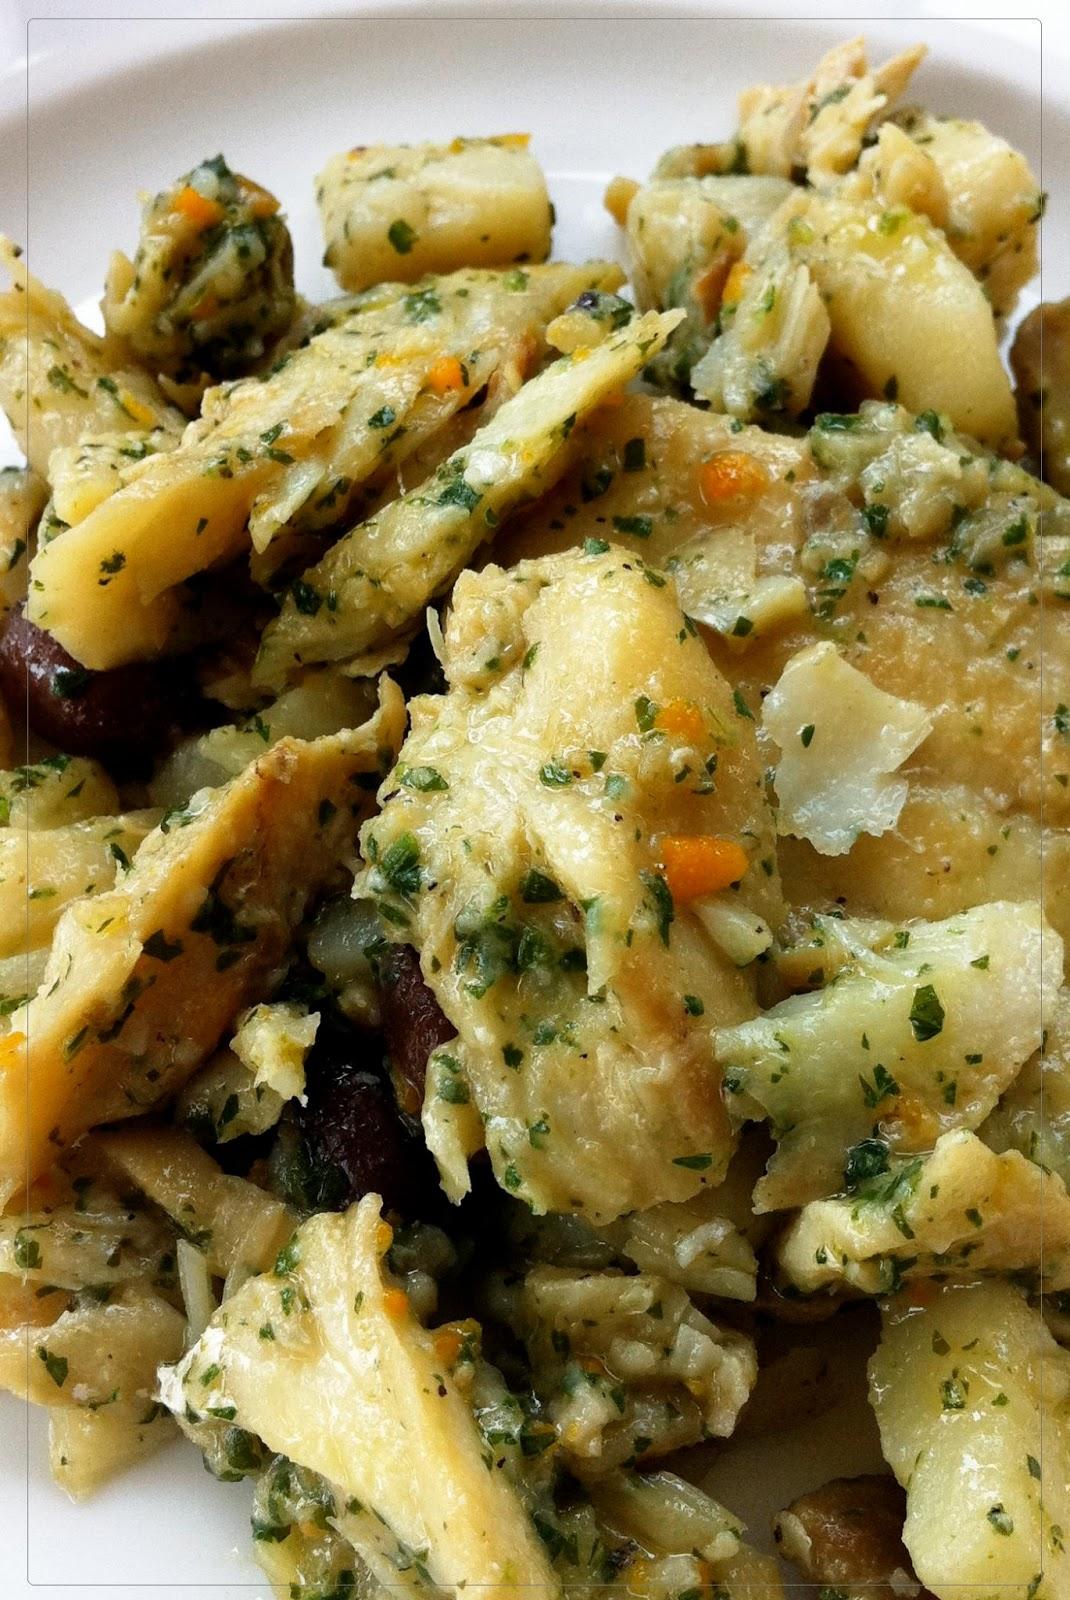 http://1.bp.blogspot.com/-IeyMm-LT99E/Ubipghc1KQI/AAAAAAAAAJM/thQ7YuTf_L8/s1600/baccala+al+verde+con+patate+-+ricette+tradizione+ligure.jpg